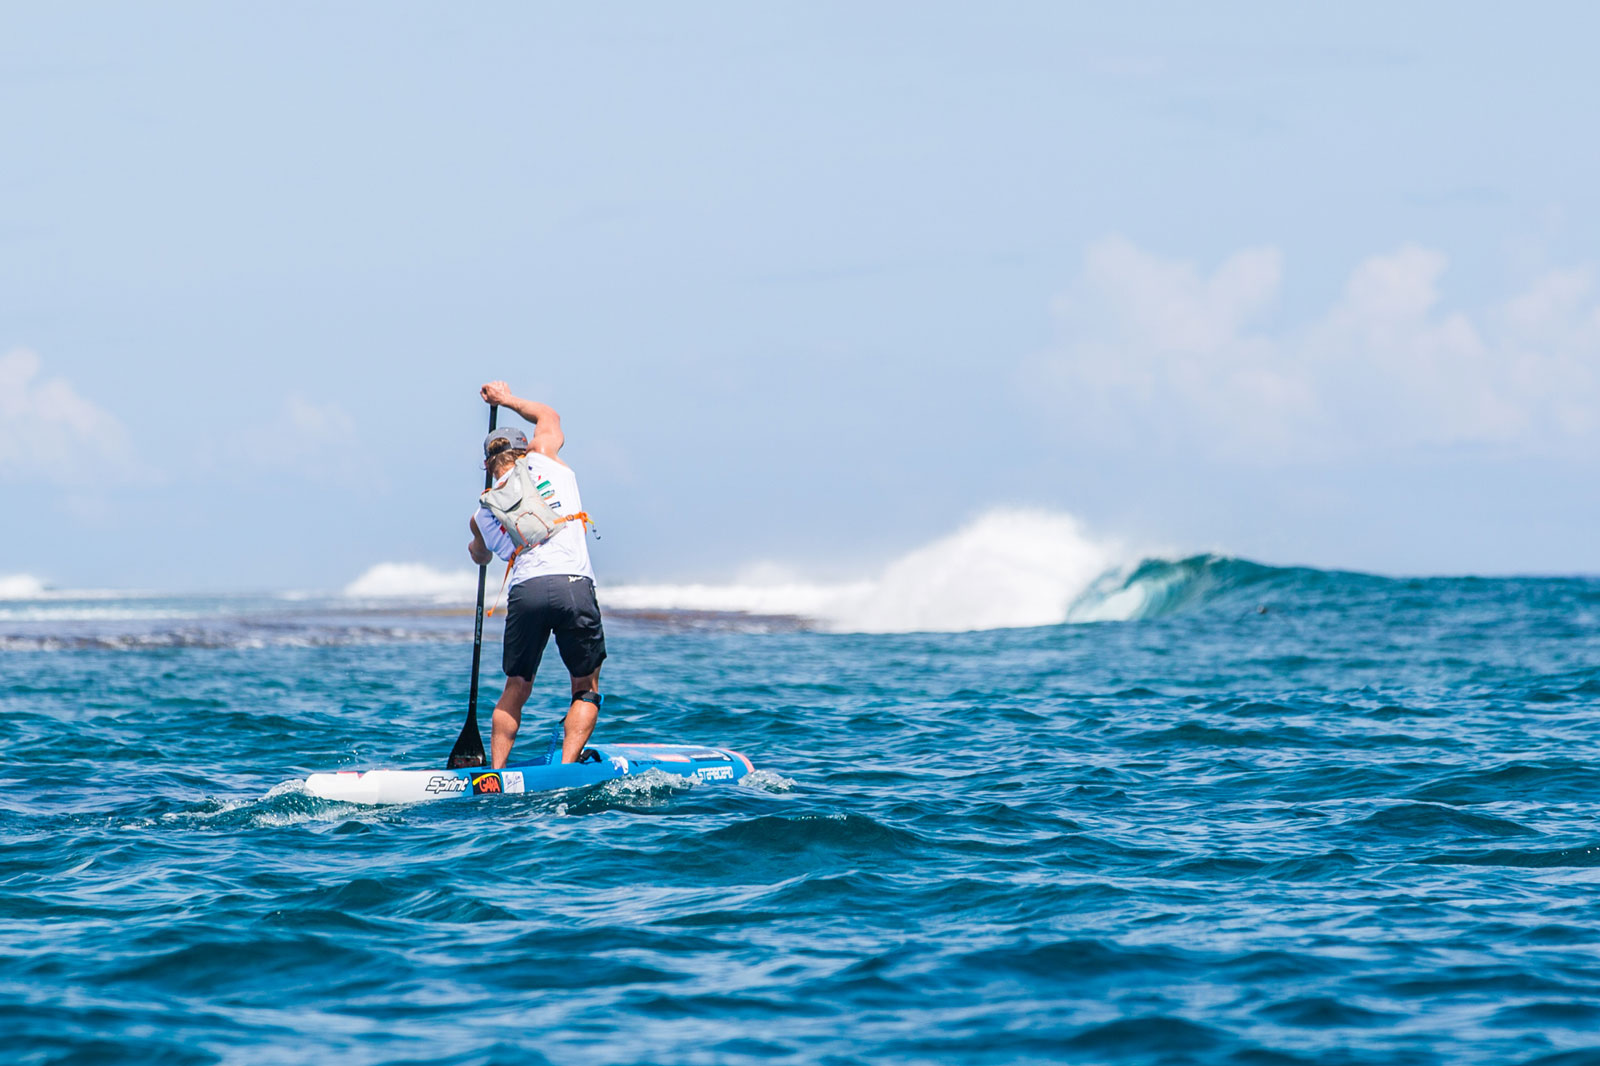 Air-France-Paddle-Festival-2018-Tahiti-Michael-Booth-Australia-1-photo-credit-Georgia-Schoefield.jpg